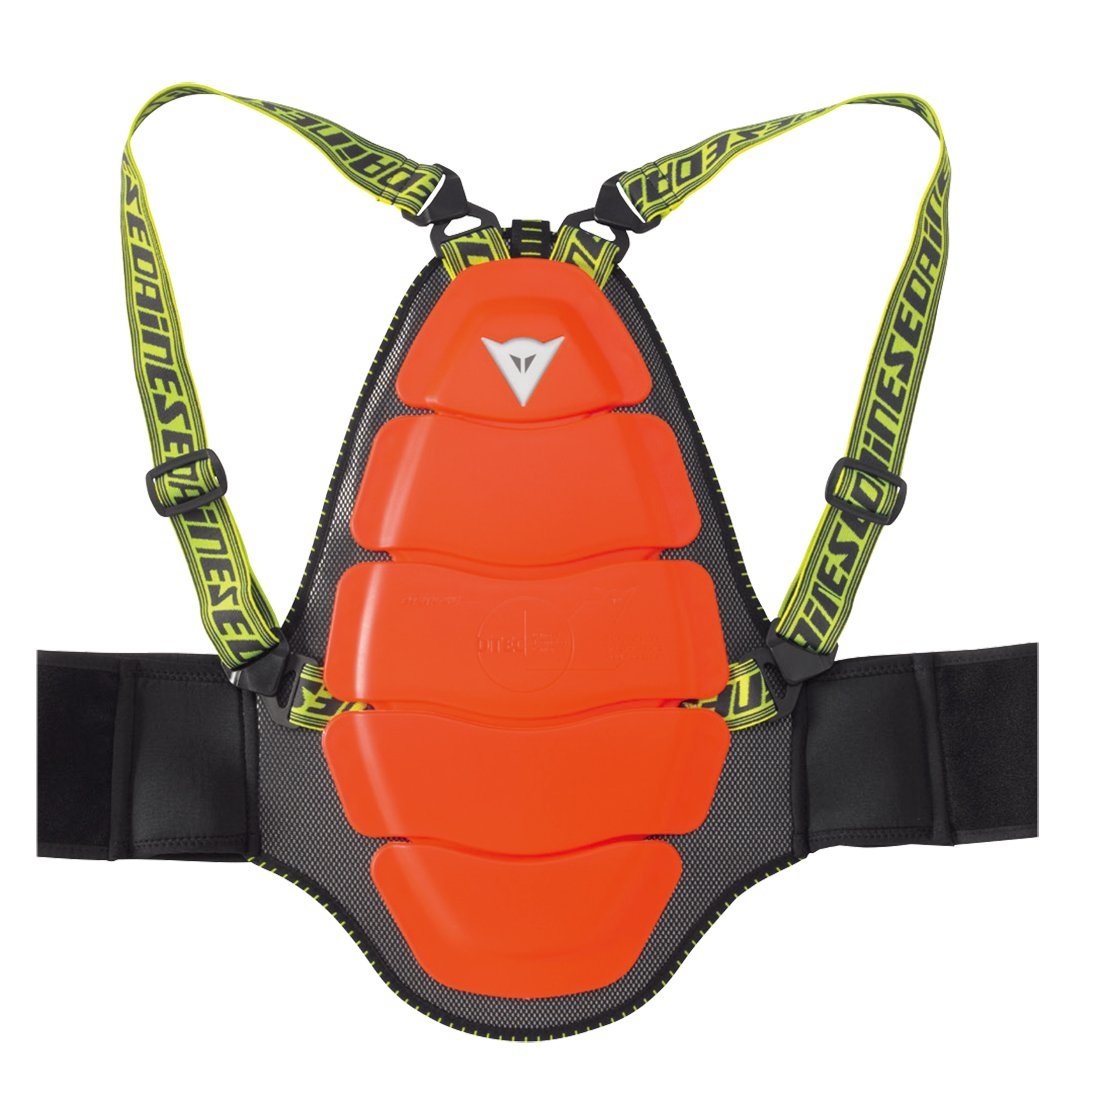 Dainese Herren 03 Evo Ski Back-Protektor